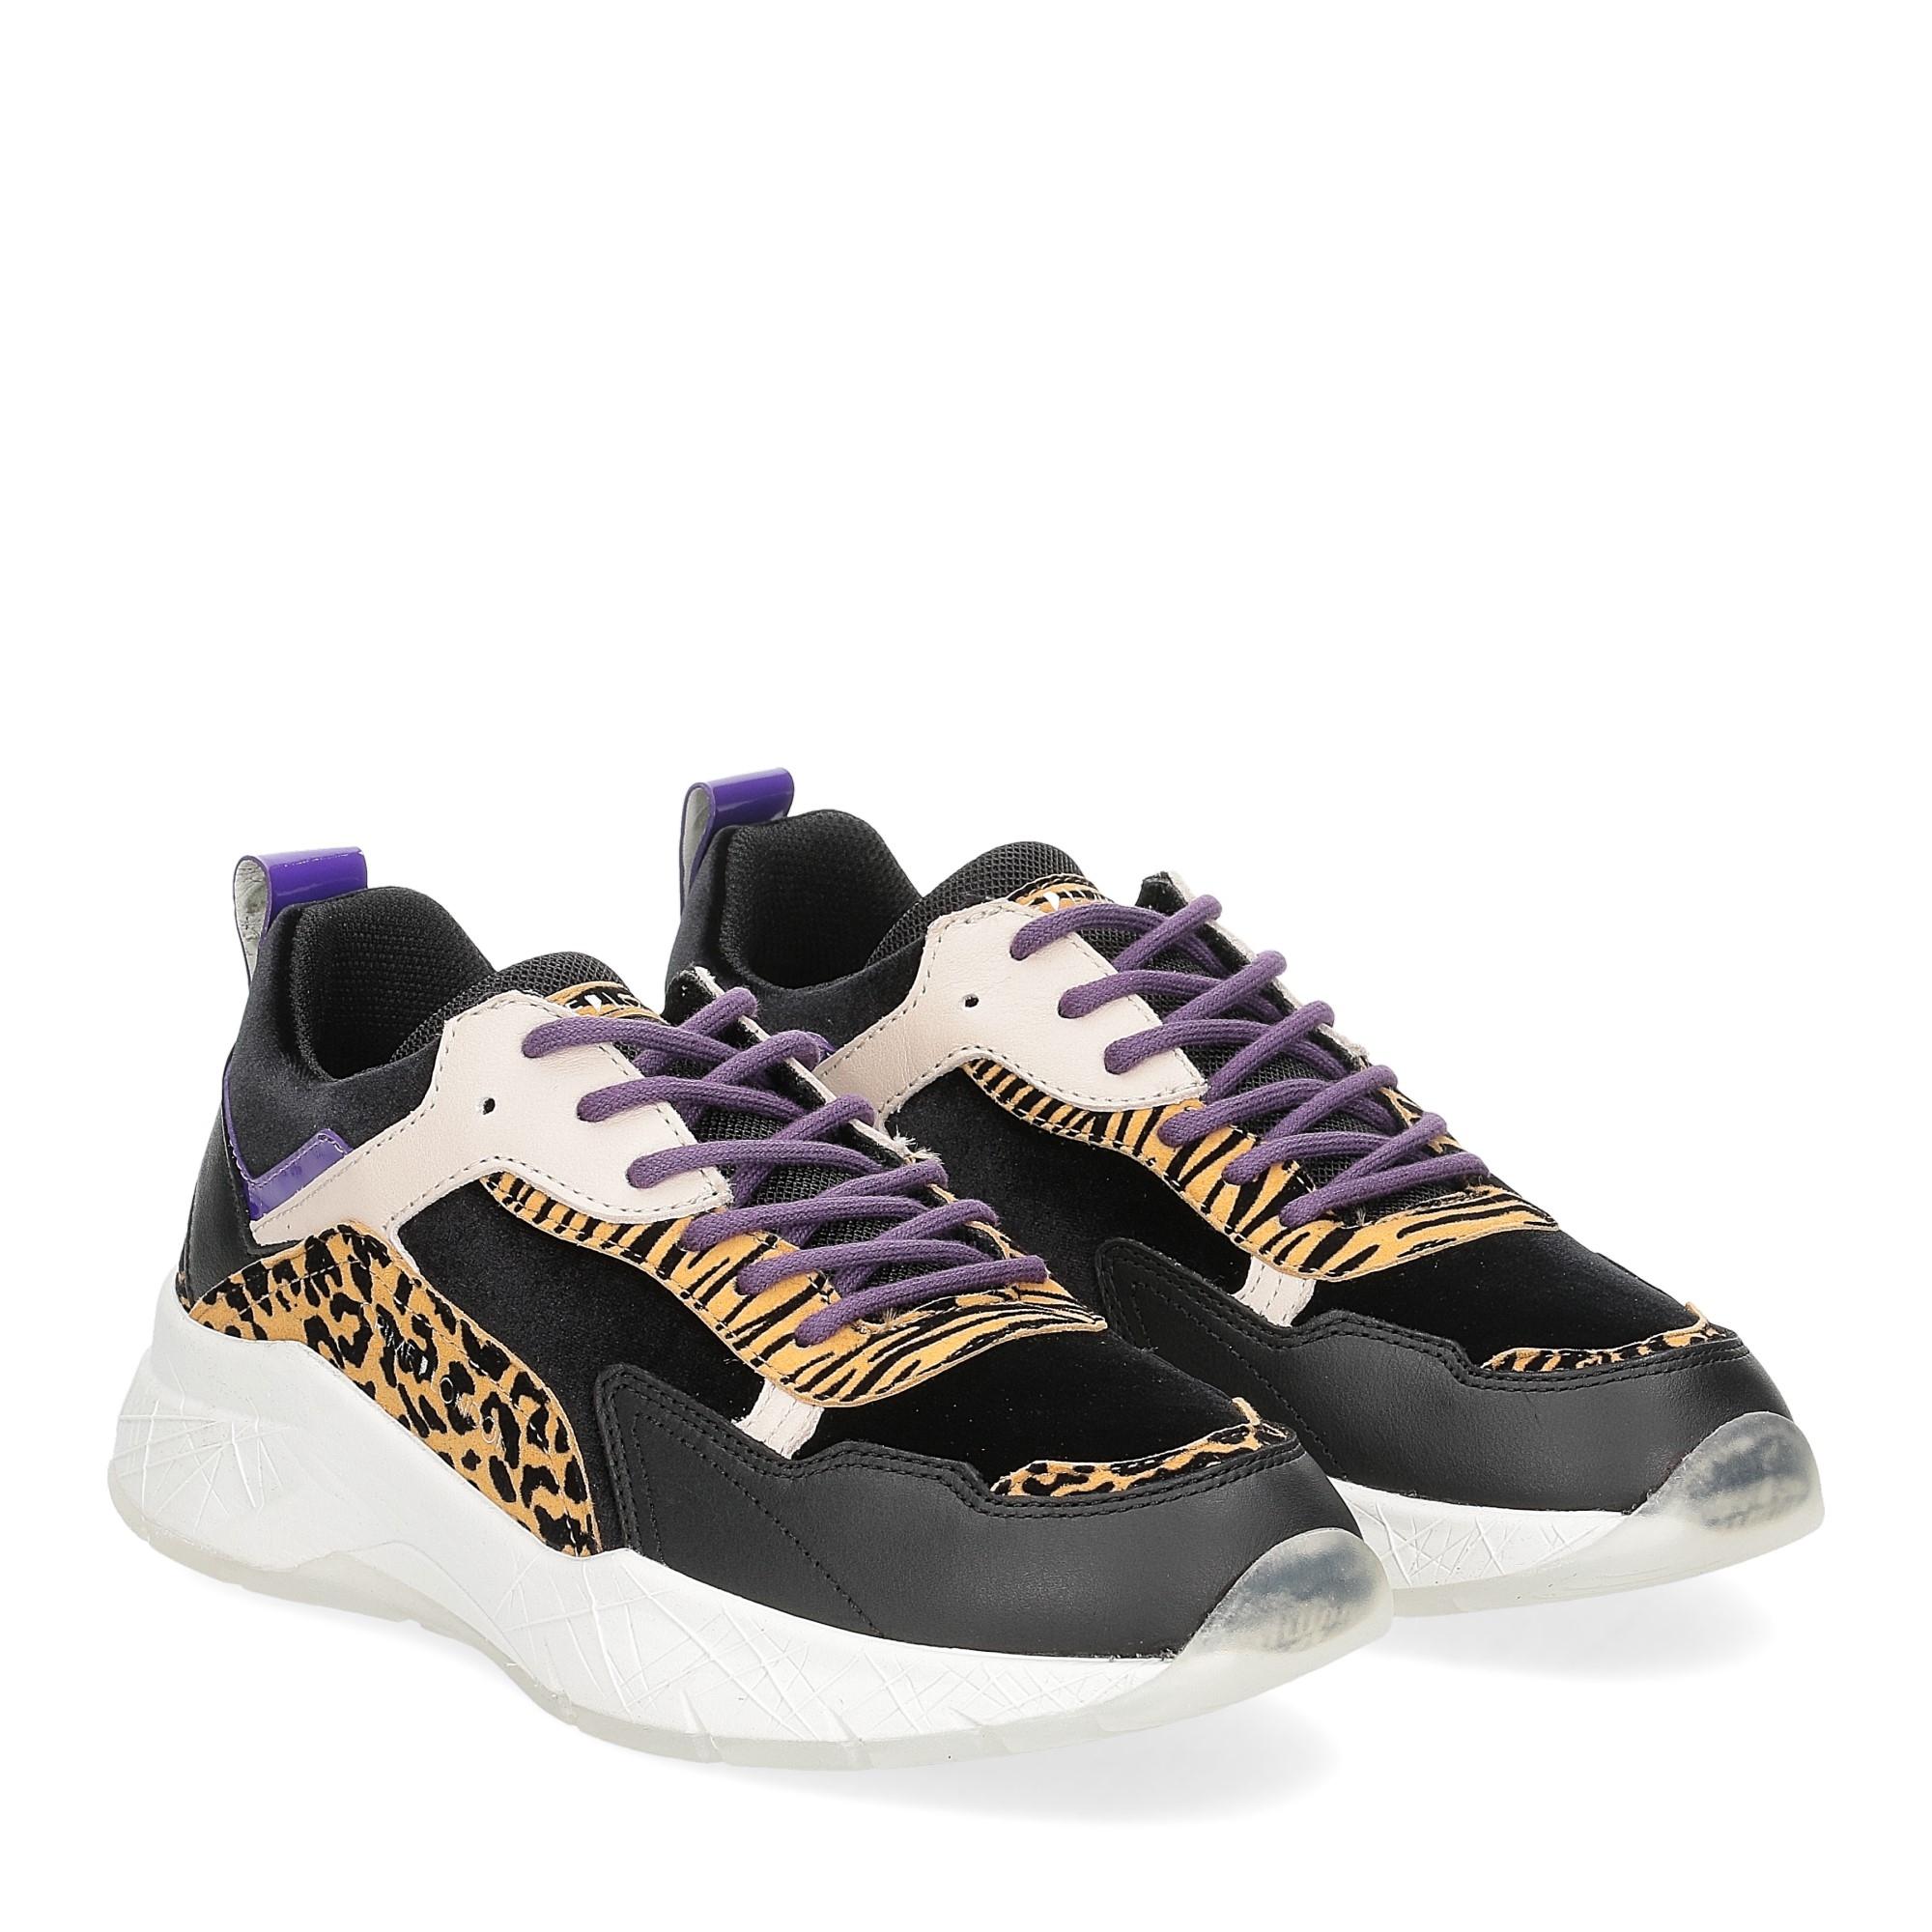 Crime London komrad leopard